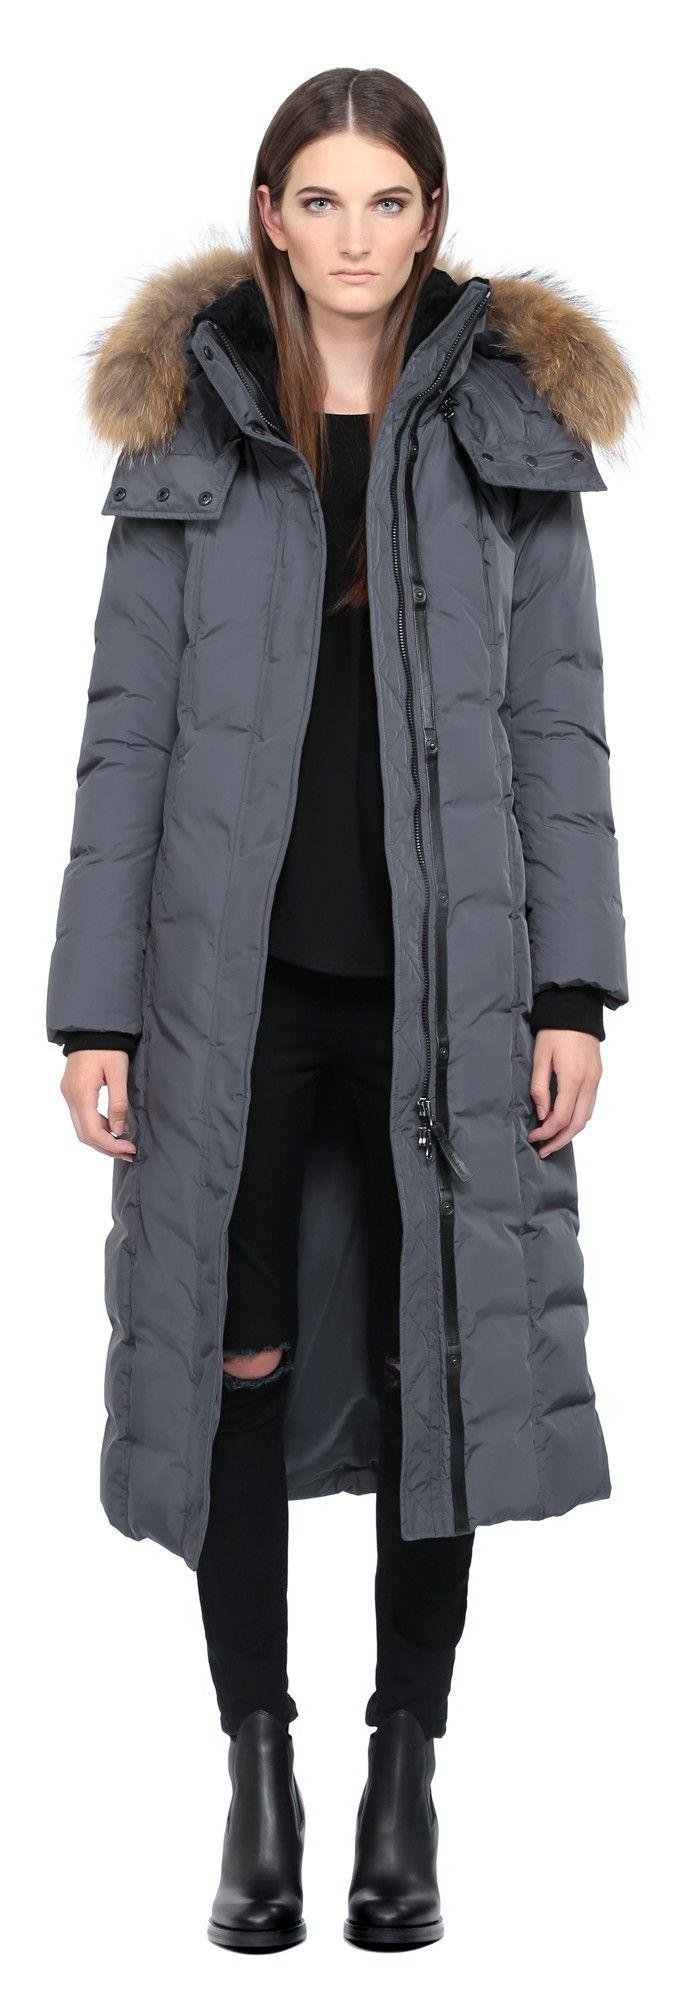 Women Mackage Charcoal Long Down Coat With Fur Hood Adtnvsf